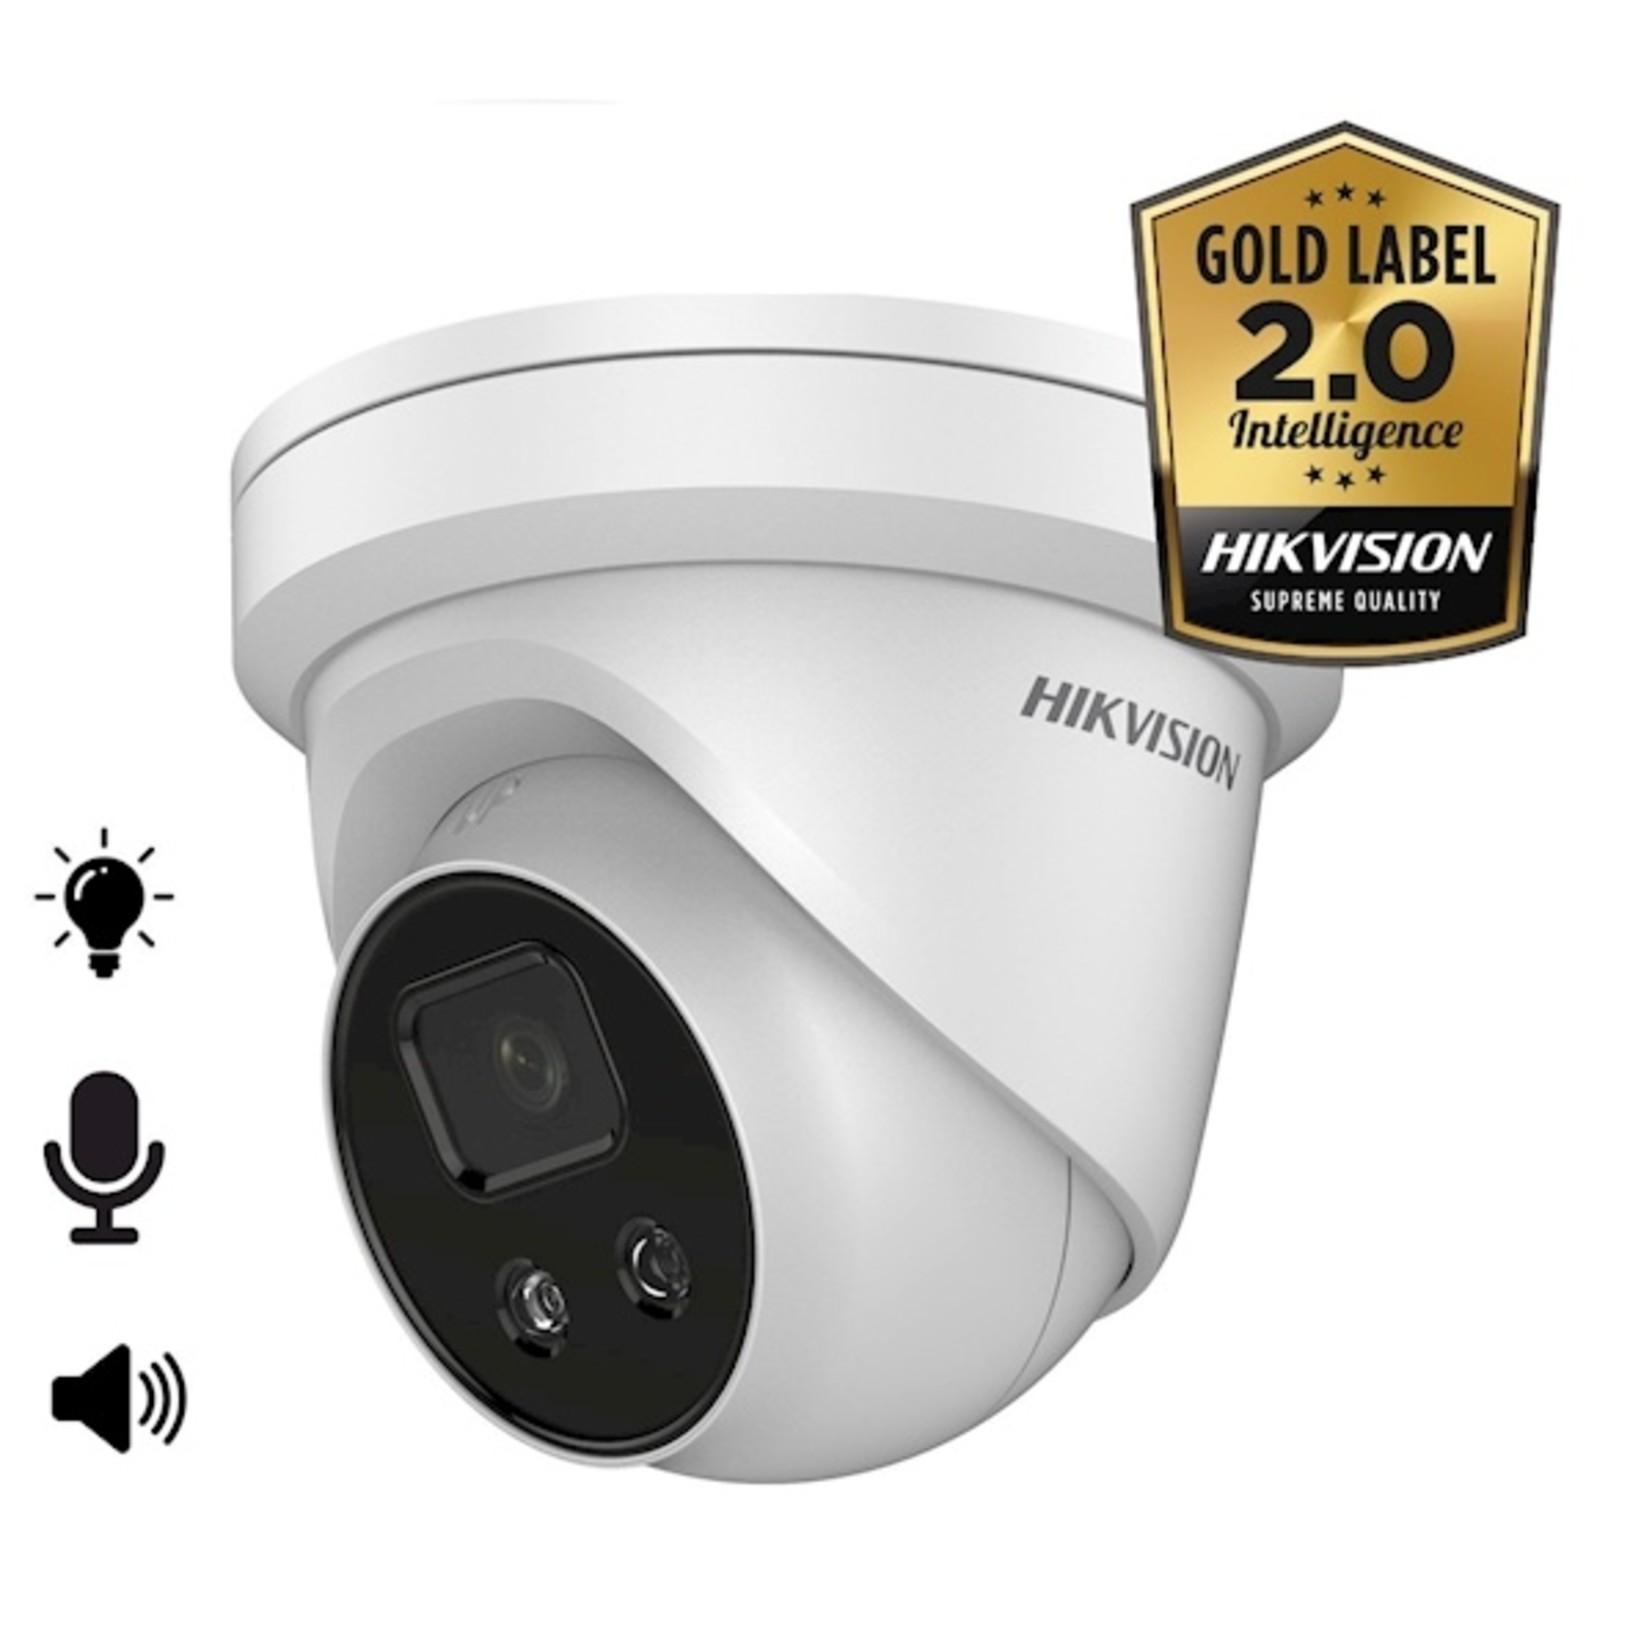 Hikvision DS-2CD2346G2-ISU/SL, 4MP, microfoon en speaker, 30m IR, WDR, Ultra Low Light